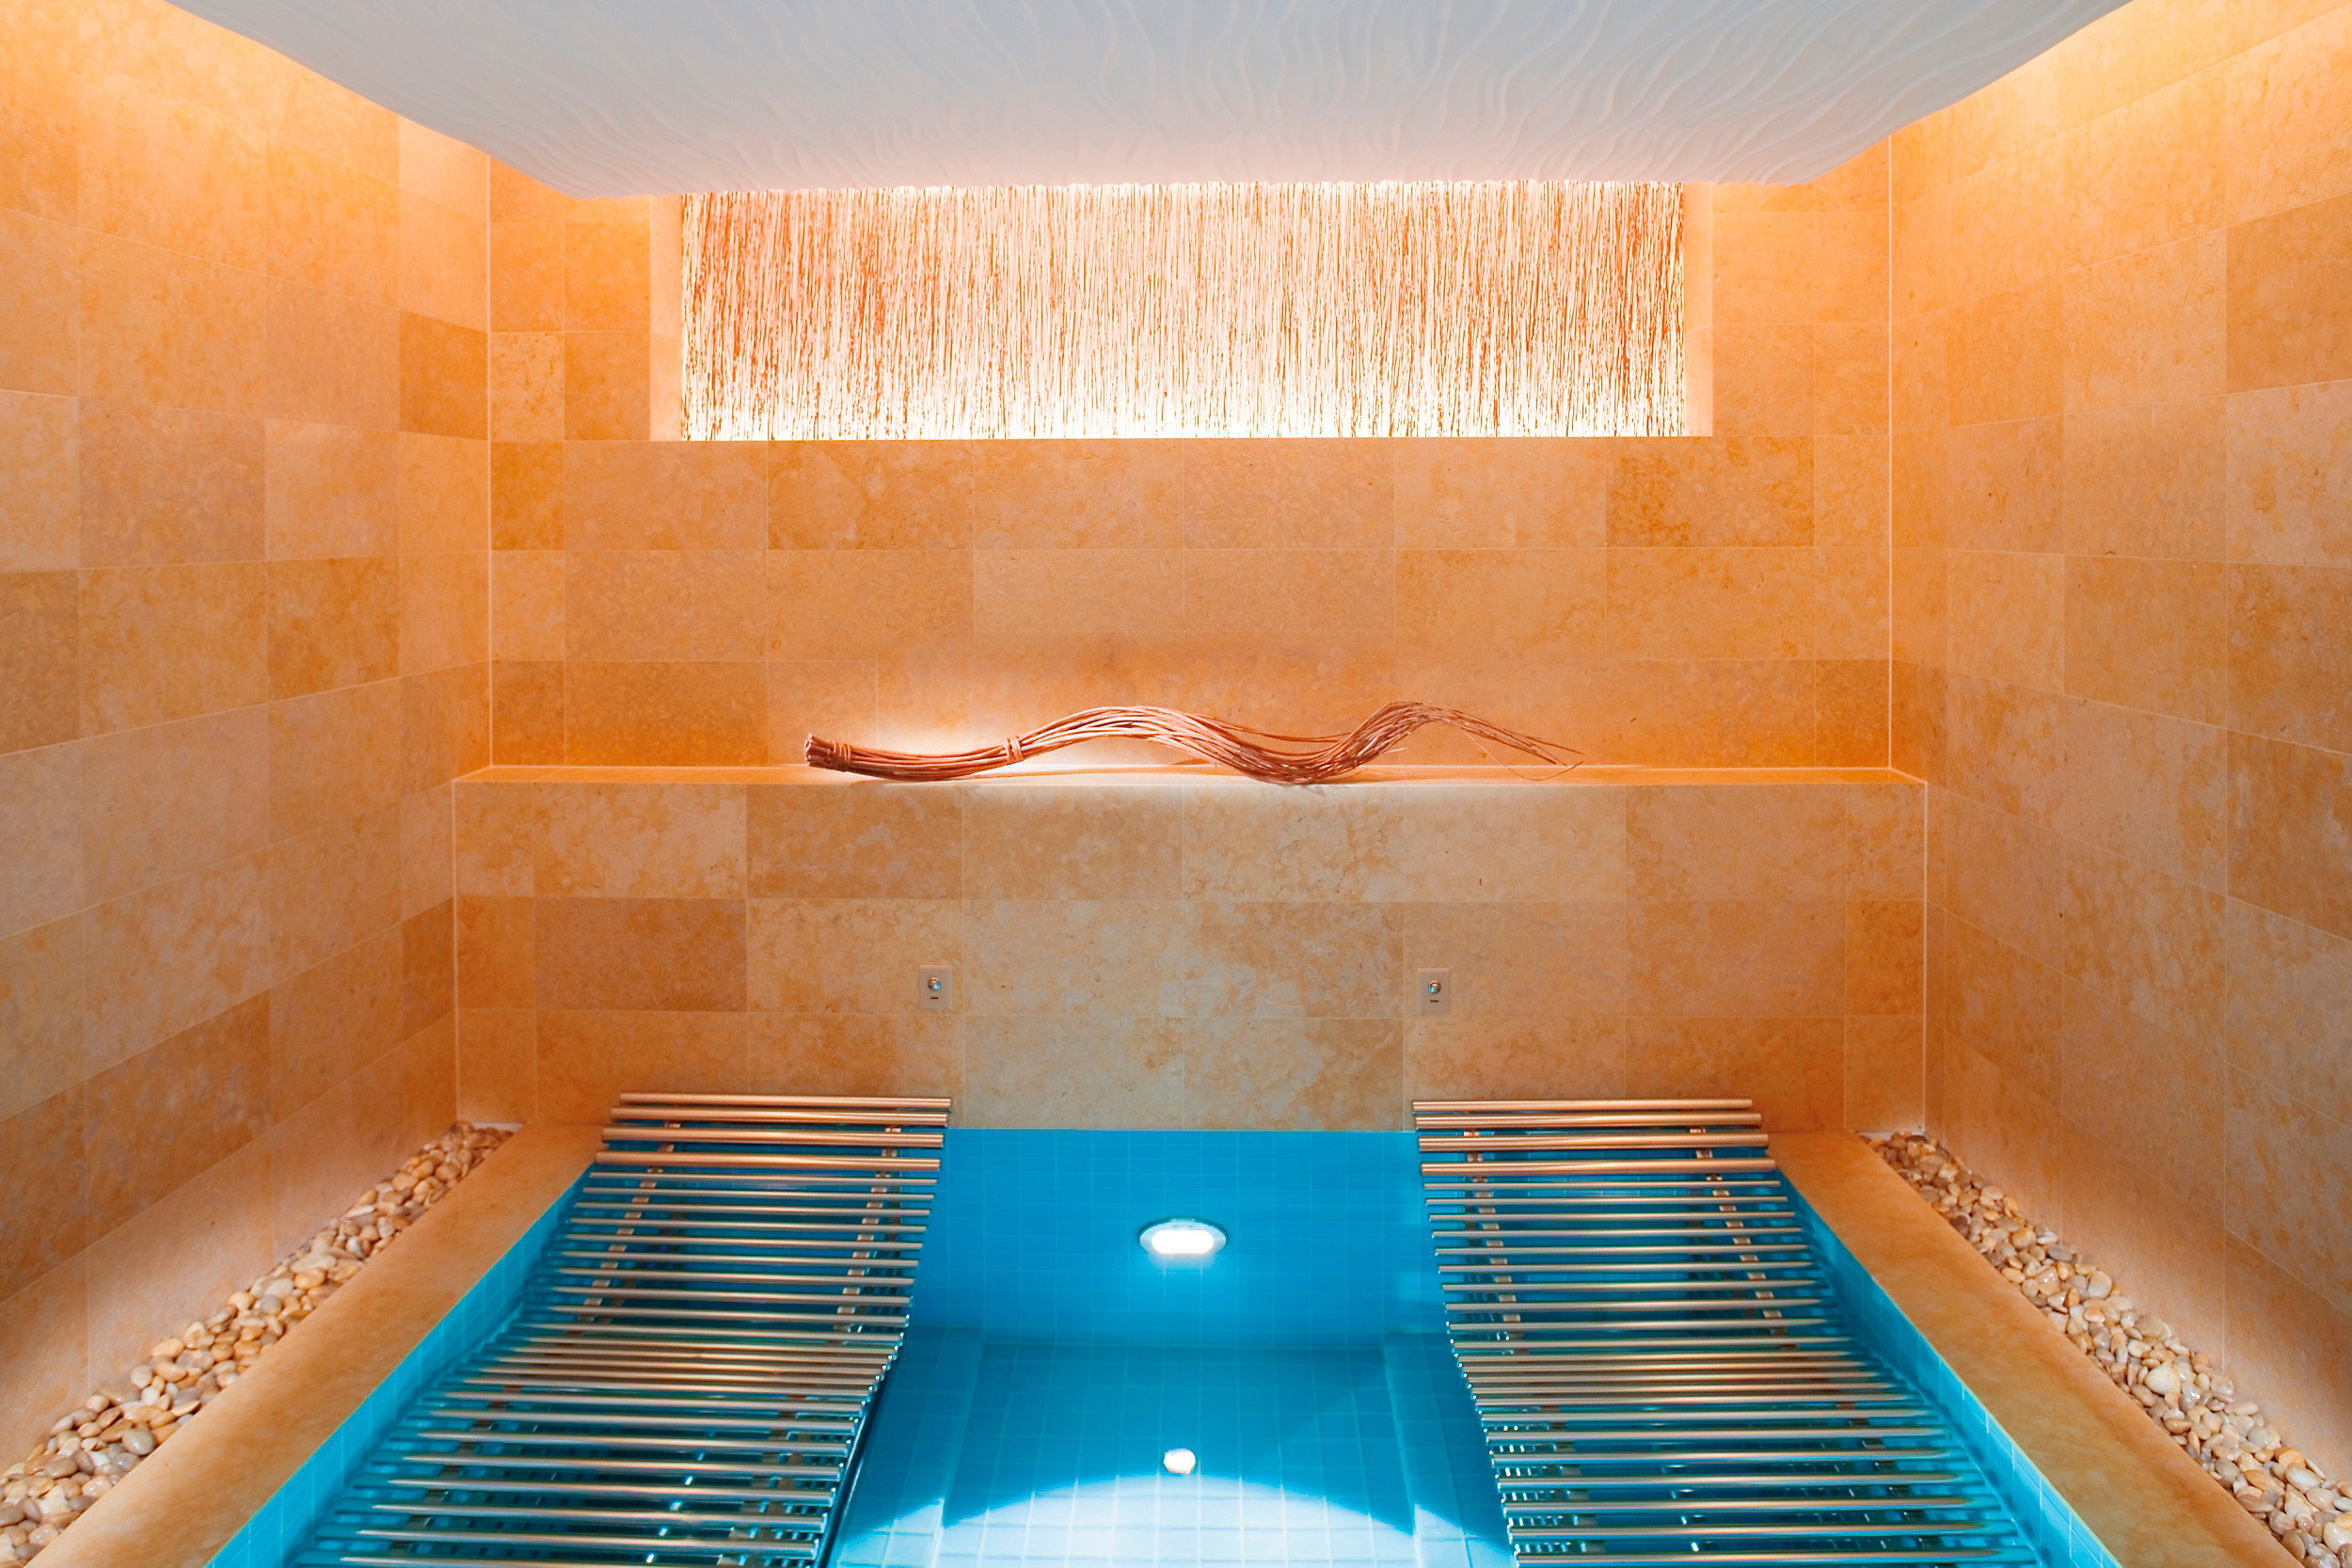 A luxurious bath in the Landmark Spa.